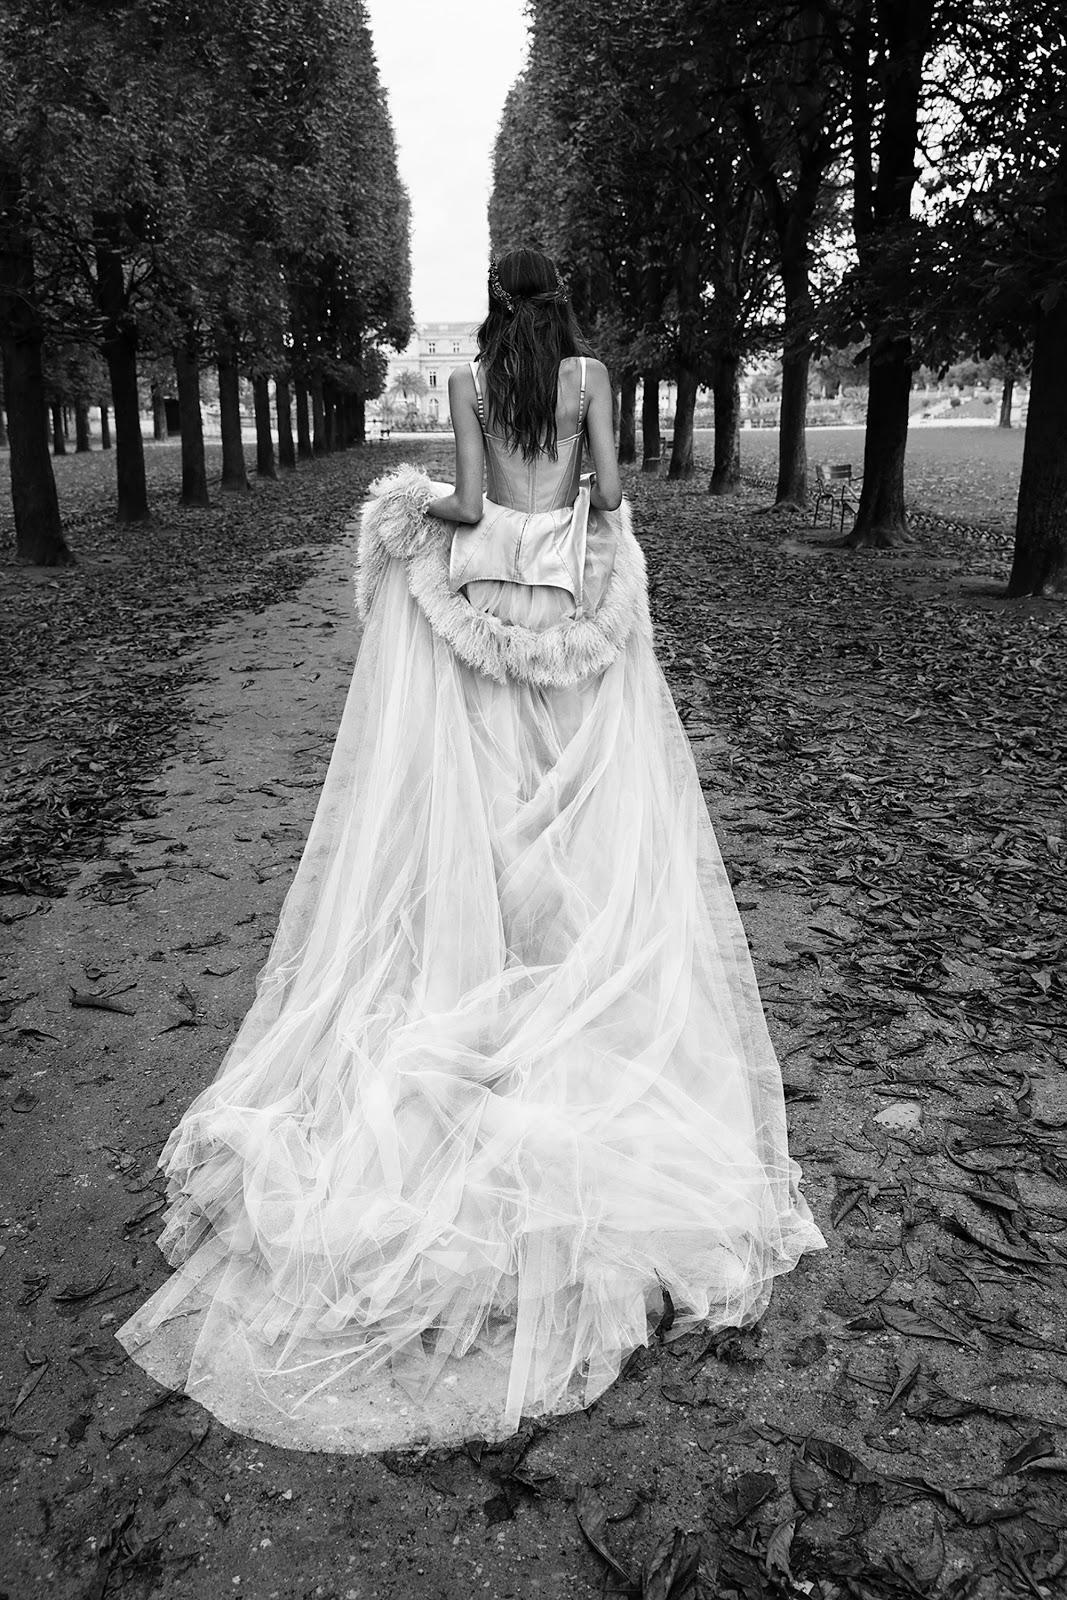 Wedding dresses vera wang bridal fall 2018 cool chic for Wedding dresses by vera wang 2017